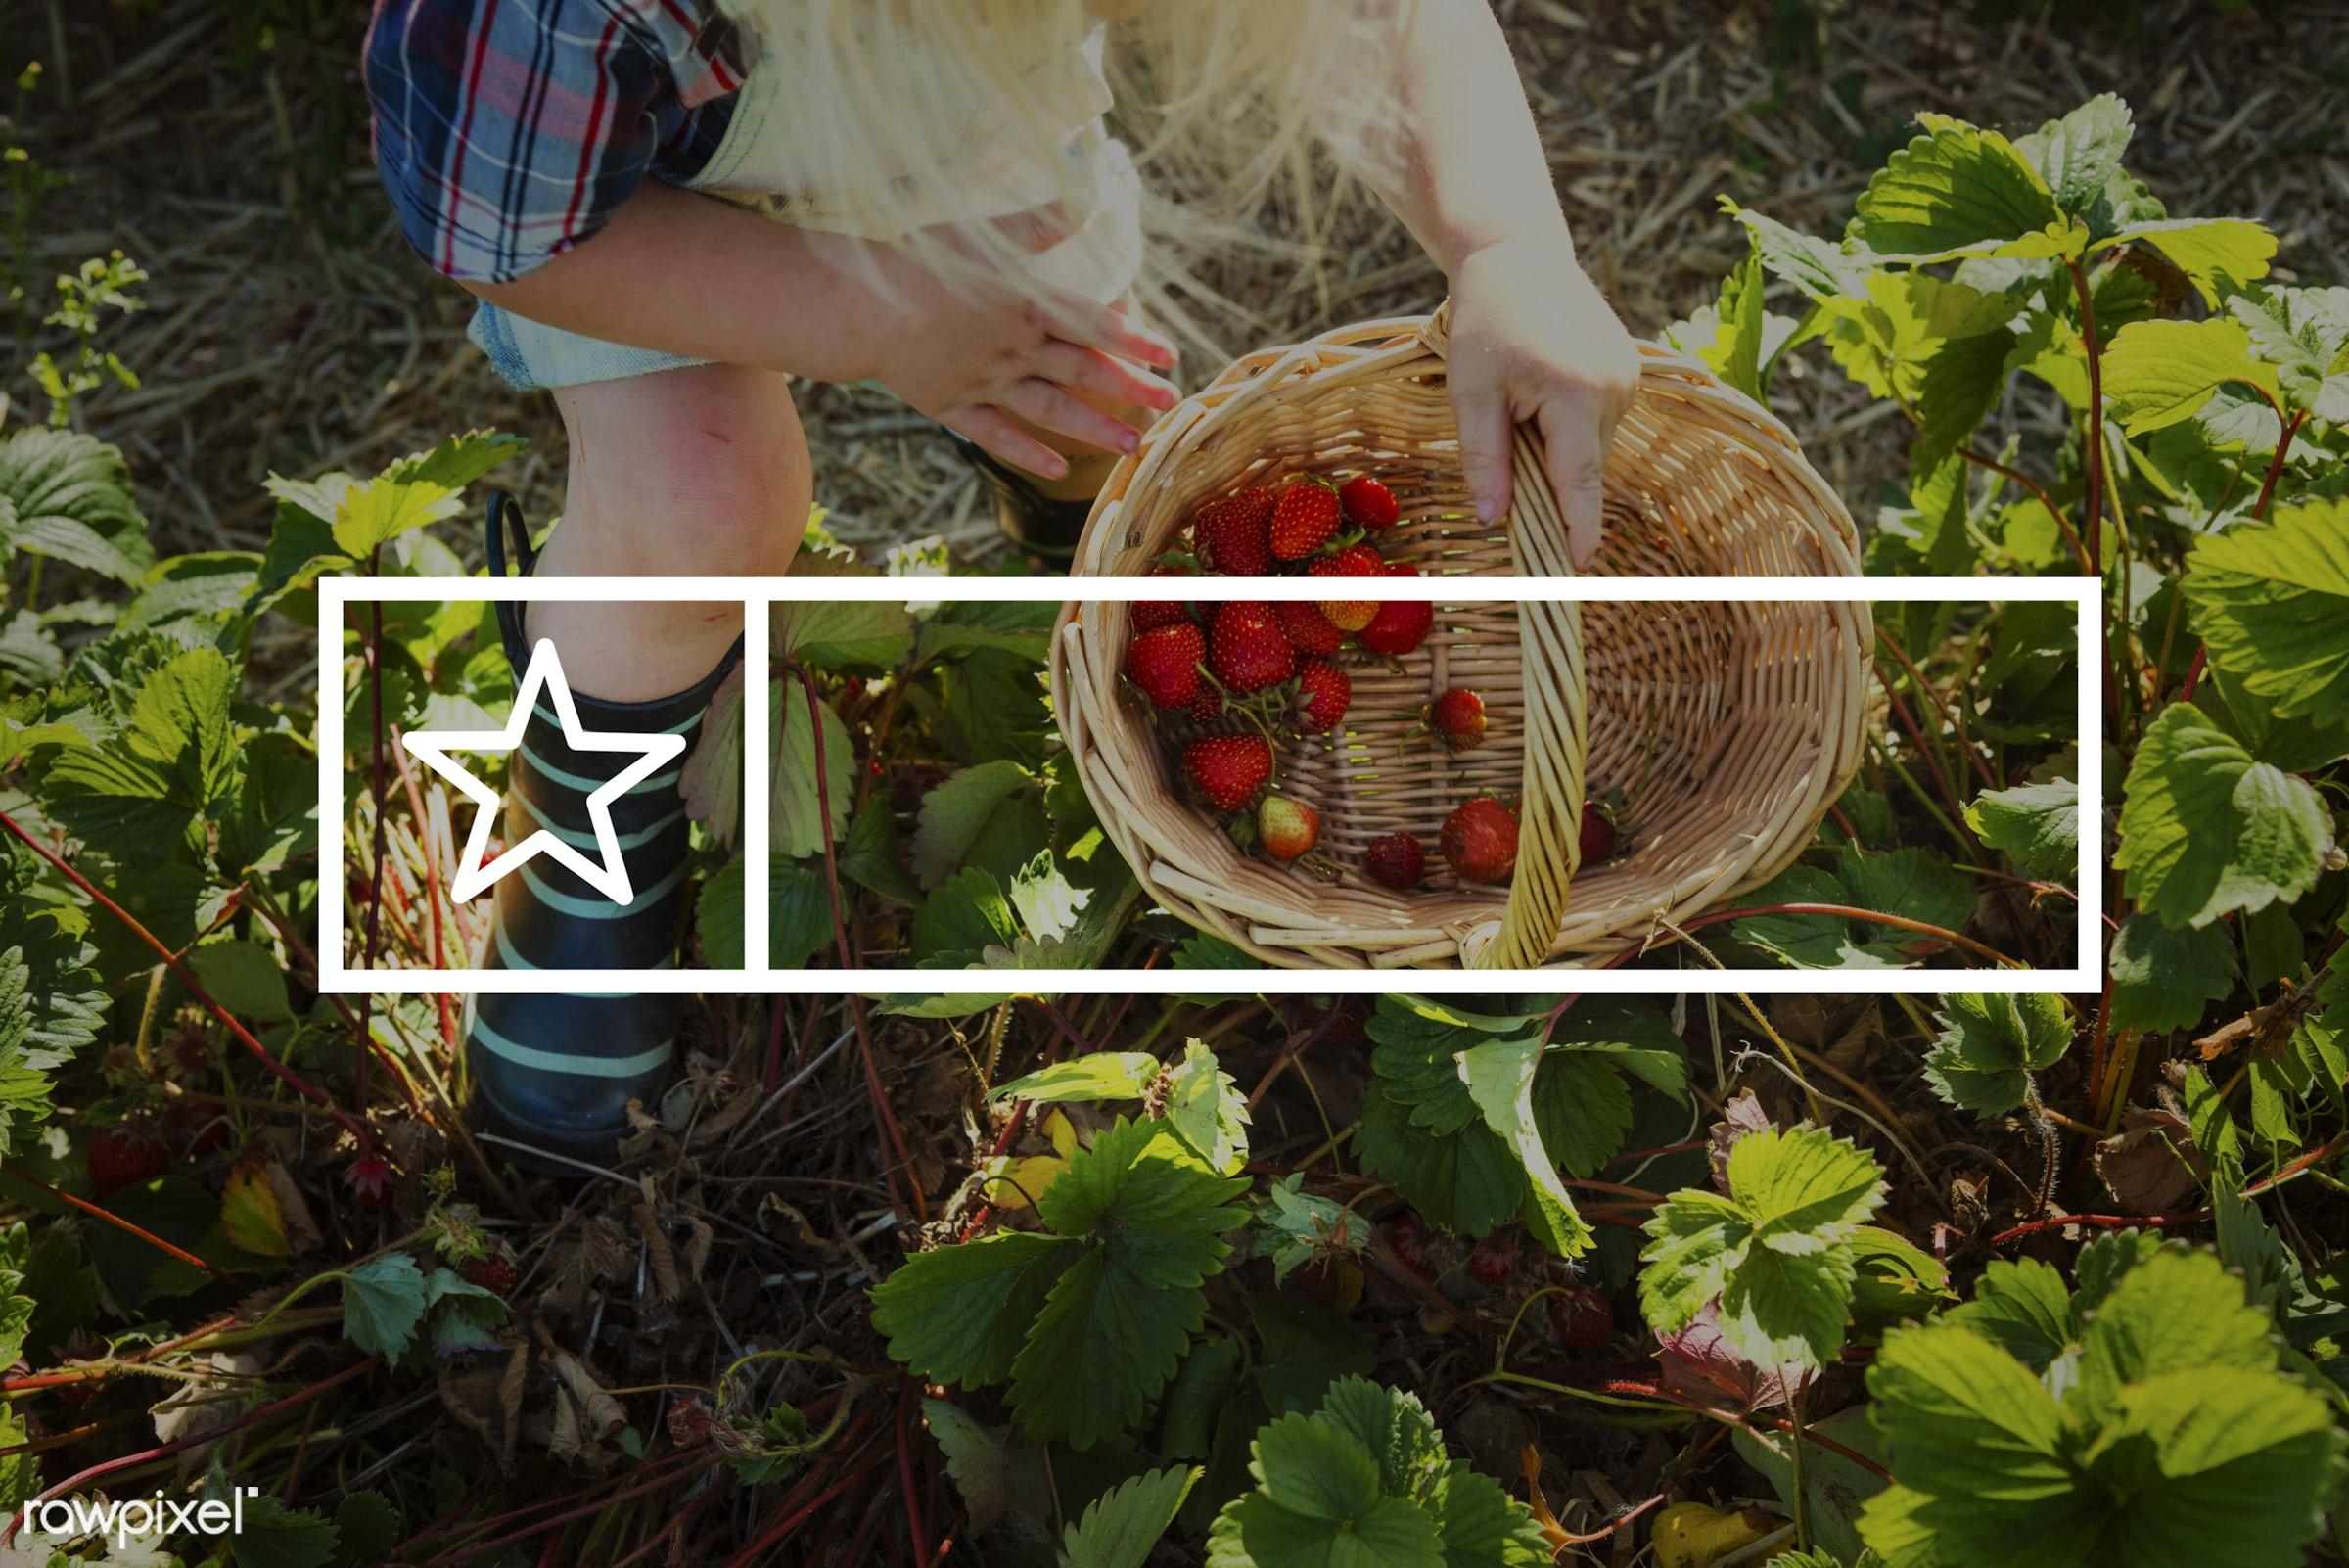 badge, banner, basket, blank, blonde, boy, caucasian, copy space, dungarees, farm, fruit, fun, holding, label, little,...